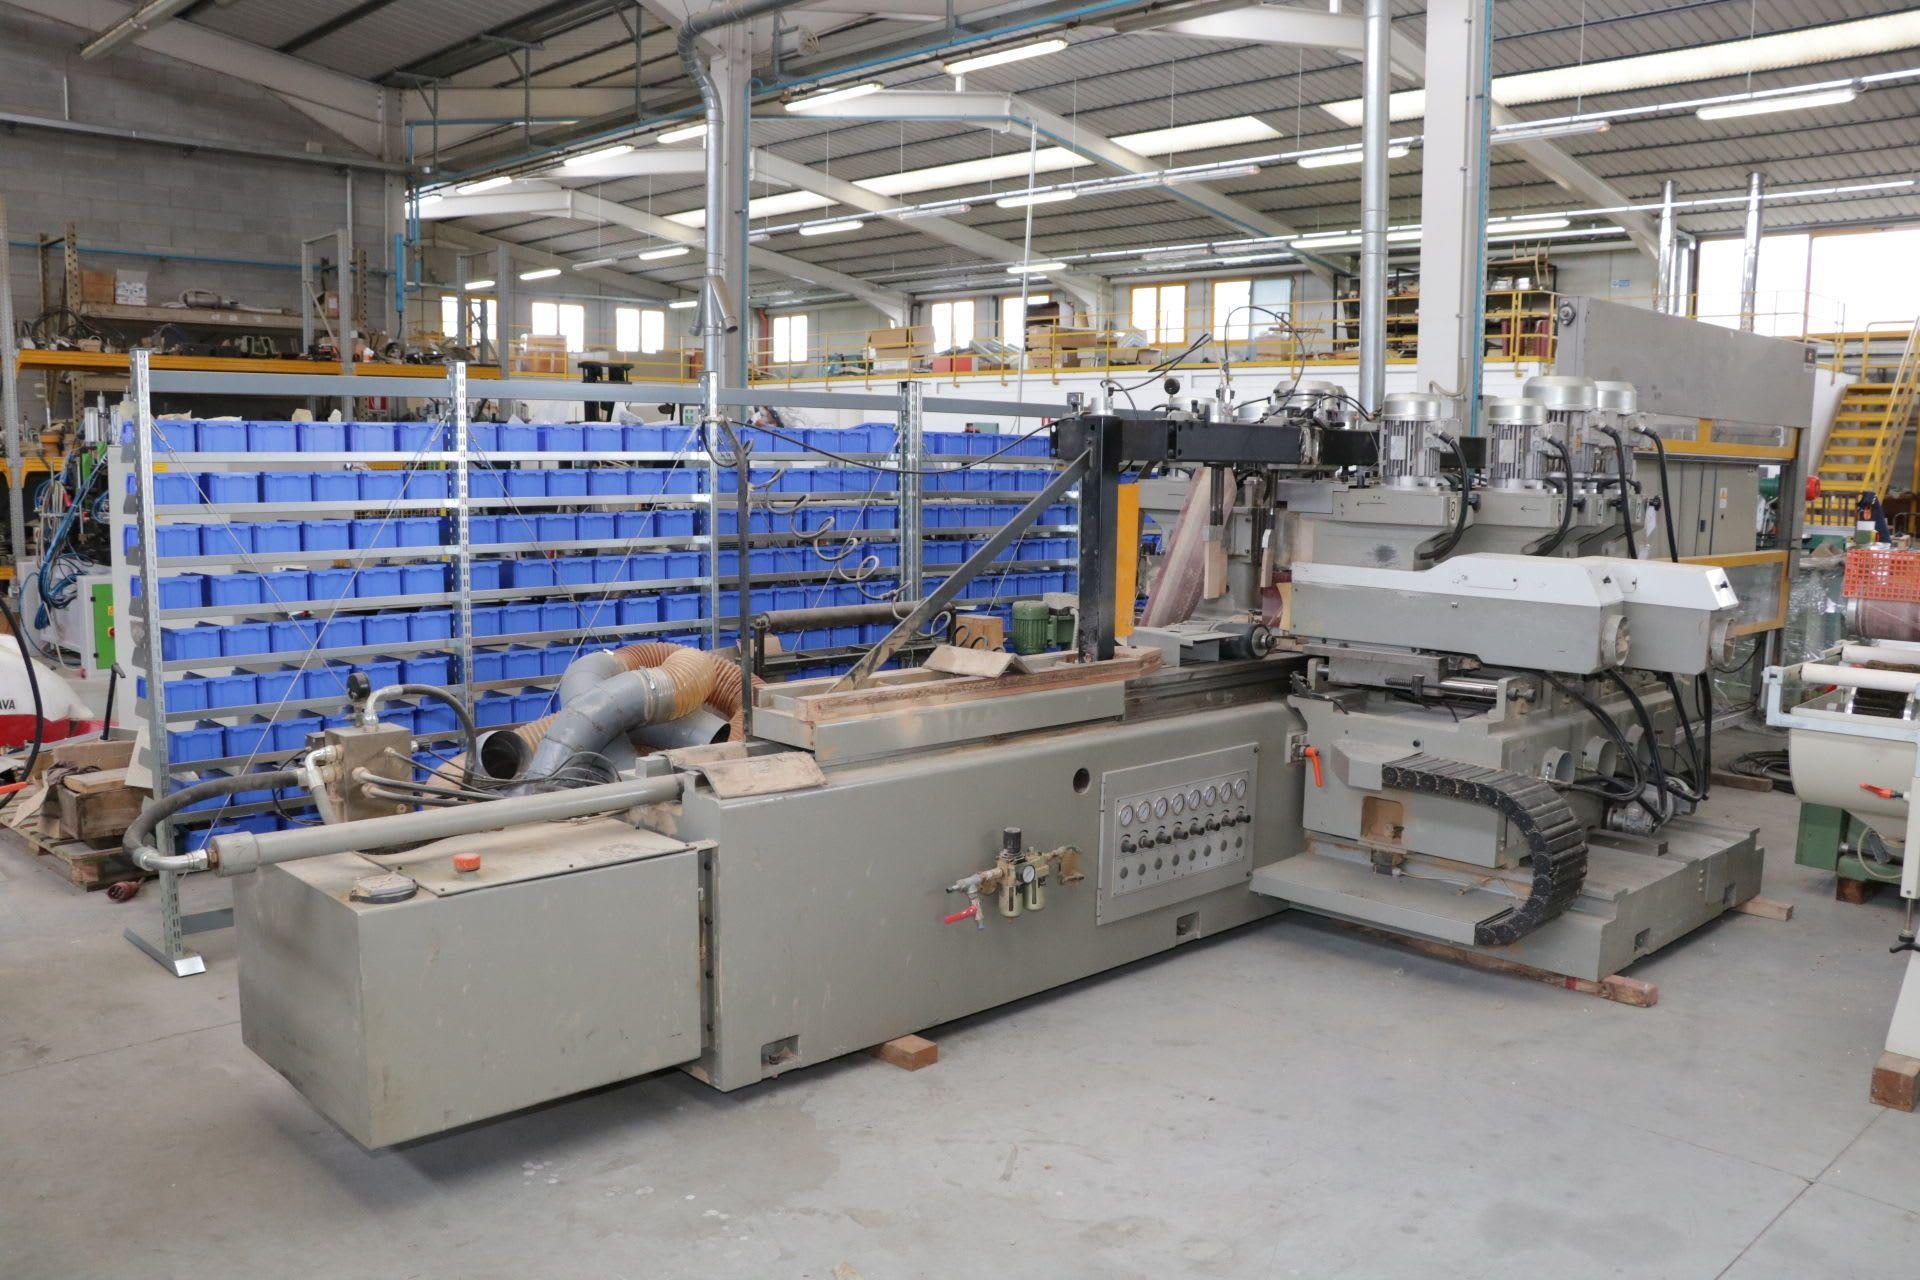 BALESTRINI CP90/8 Lineare Fräsmaschine